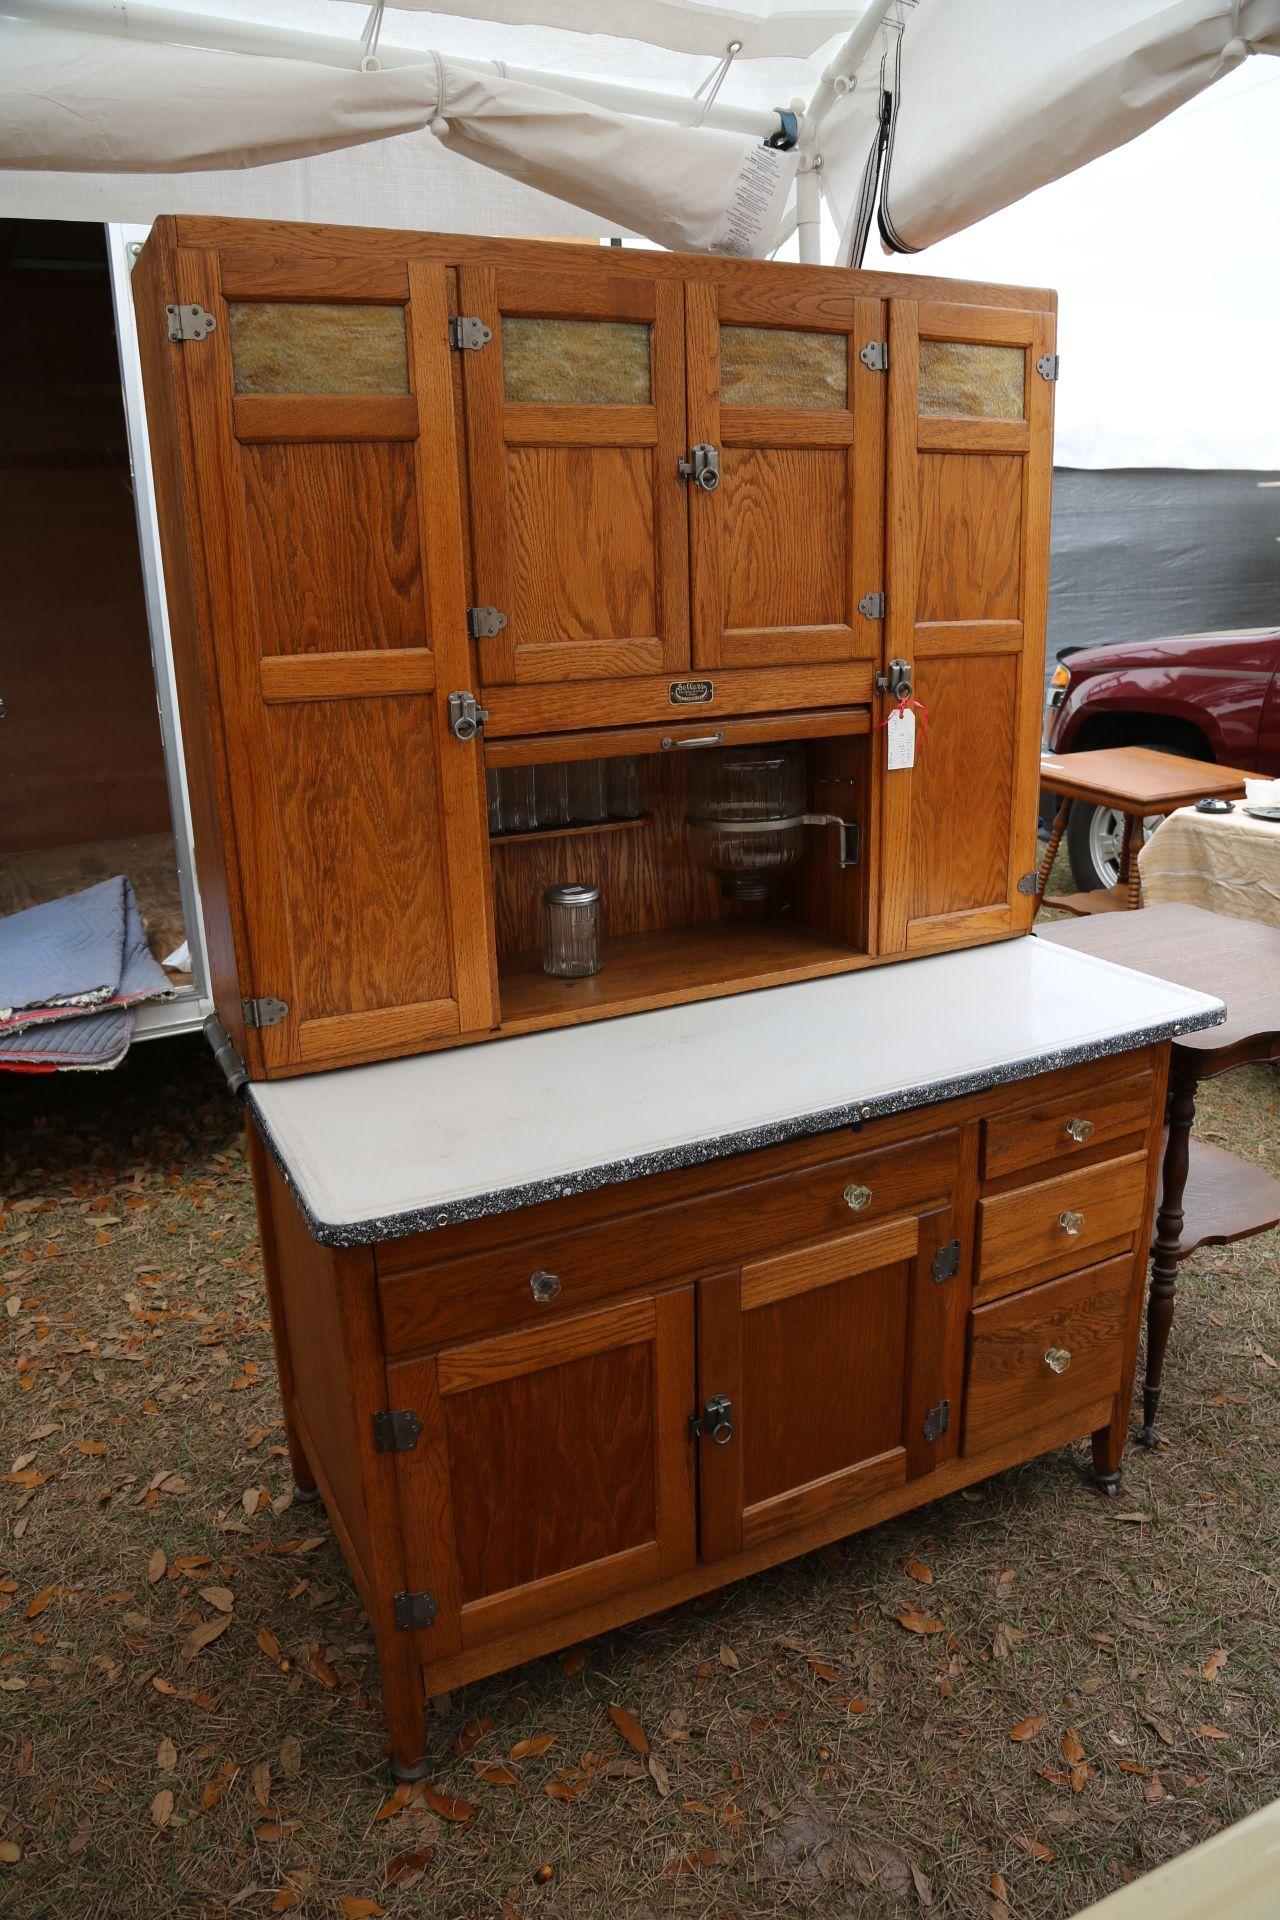 Best Kitchen Gallery: Extra Wide Sellers Cabi With Slag Glass Hoosier Cabi S of Wilson Antique Kitchen Cabinet on rachelxblog.com